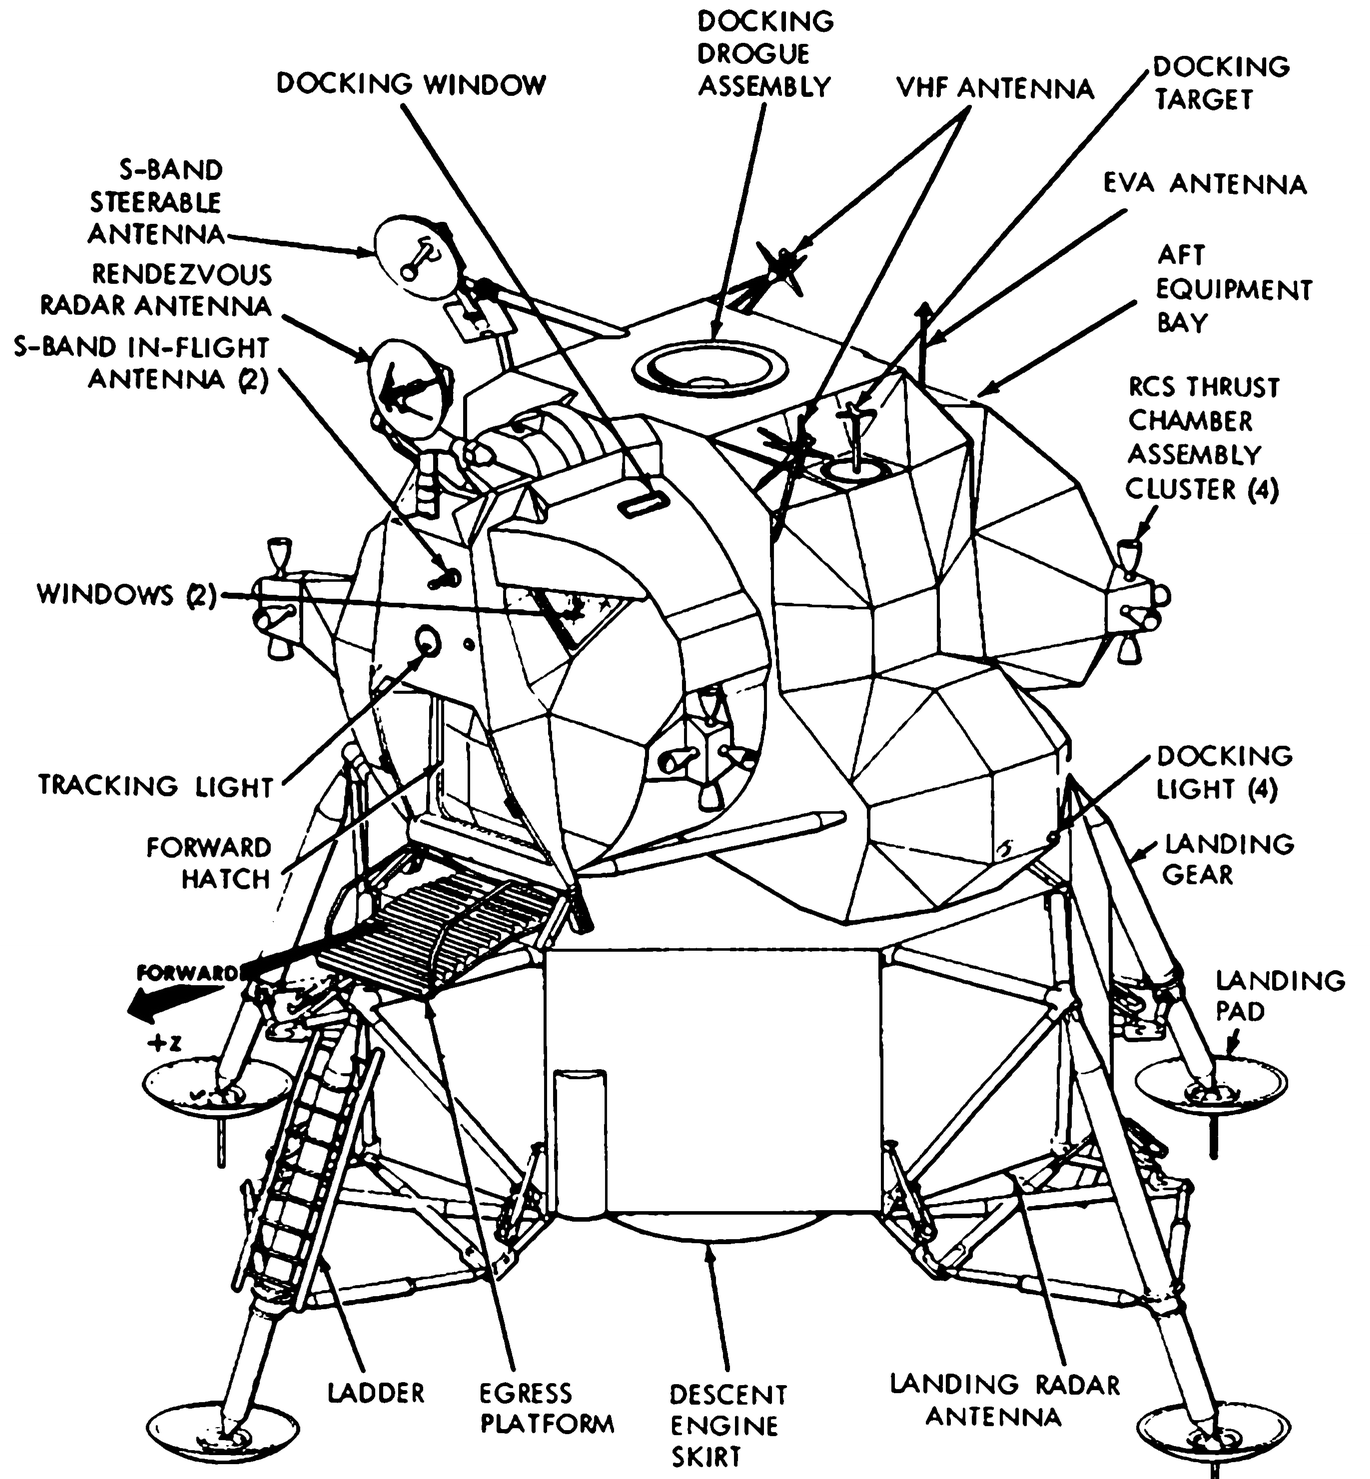 the apollo lunar module springerlinkopen image in new window